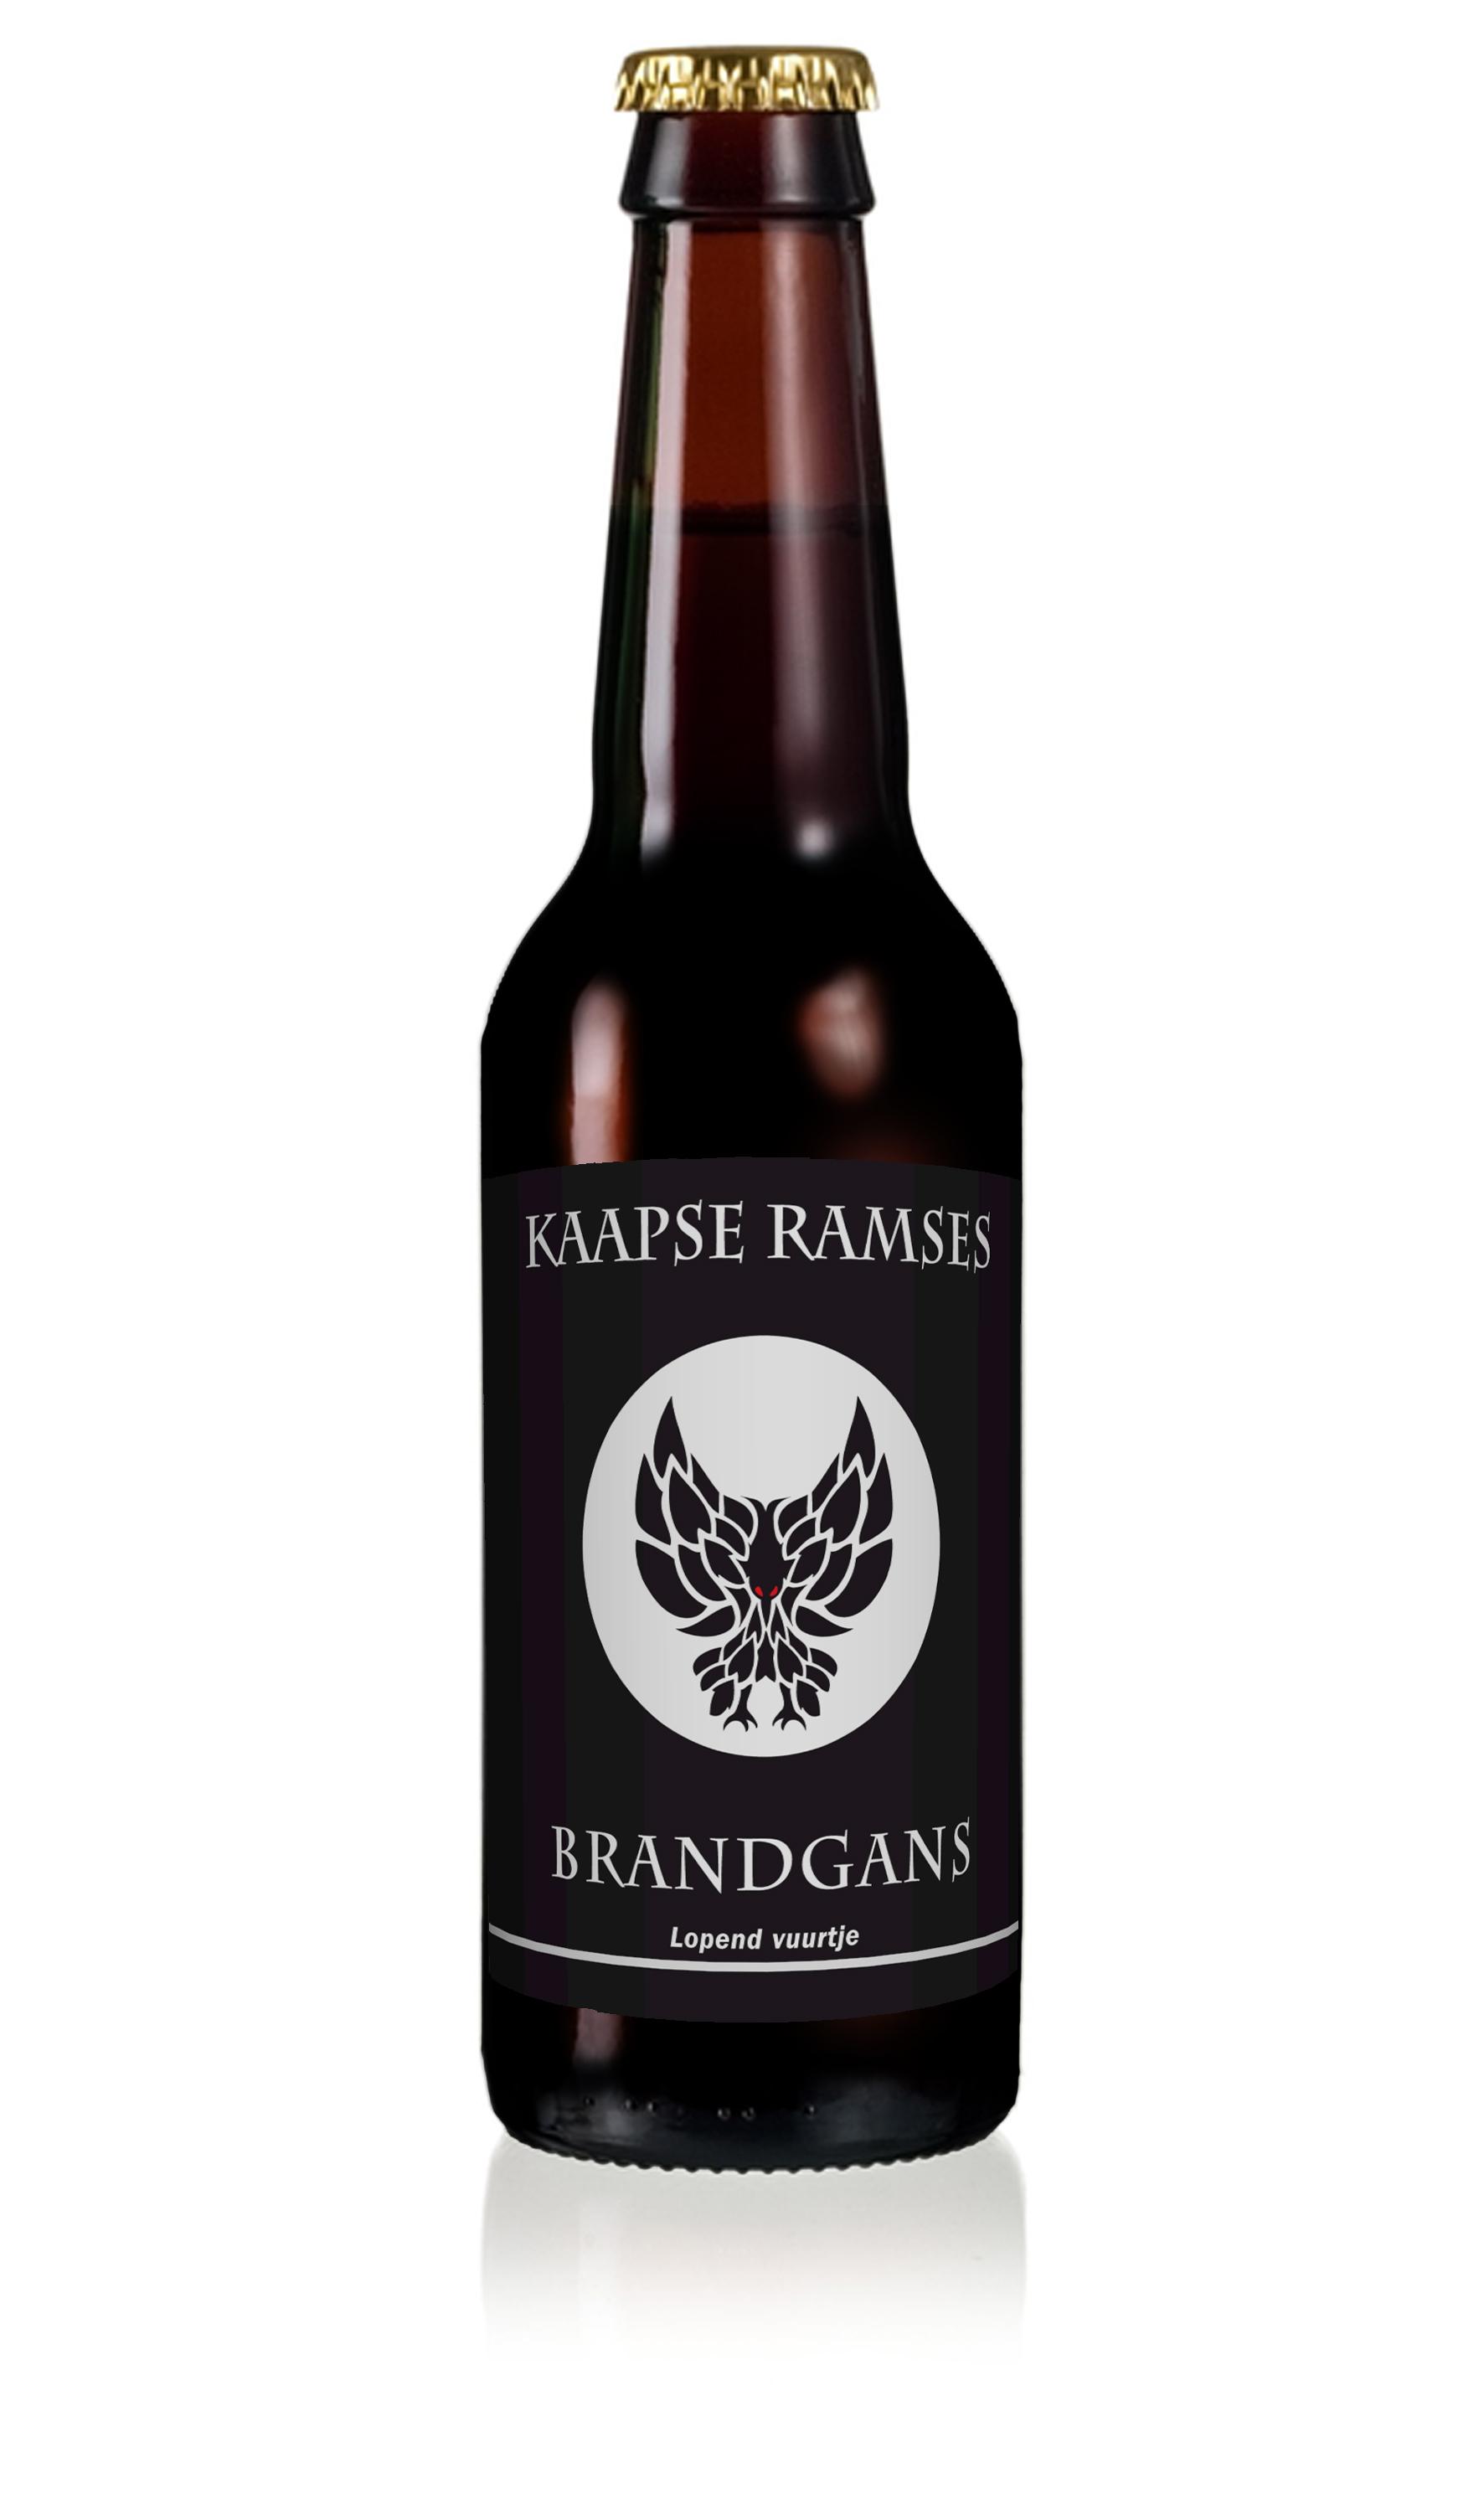 Brandgans